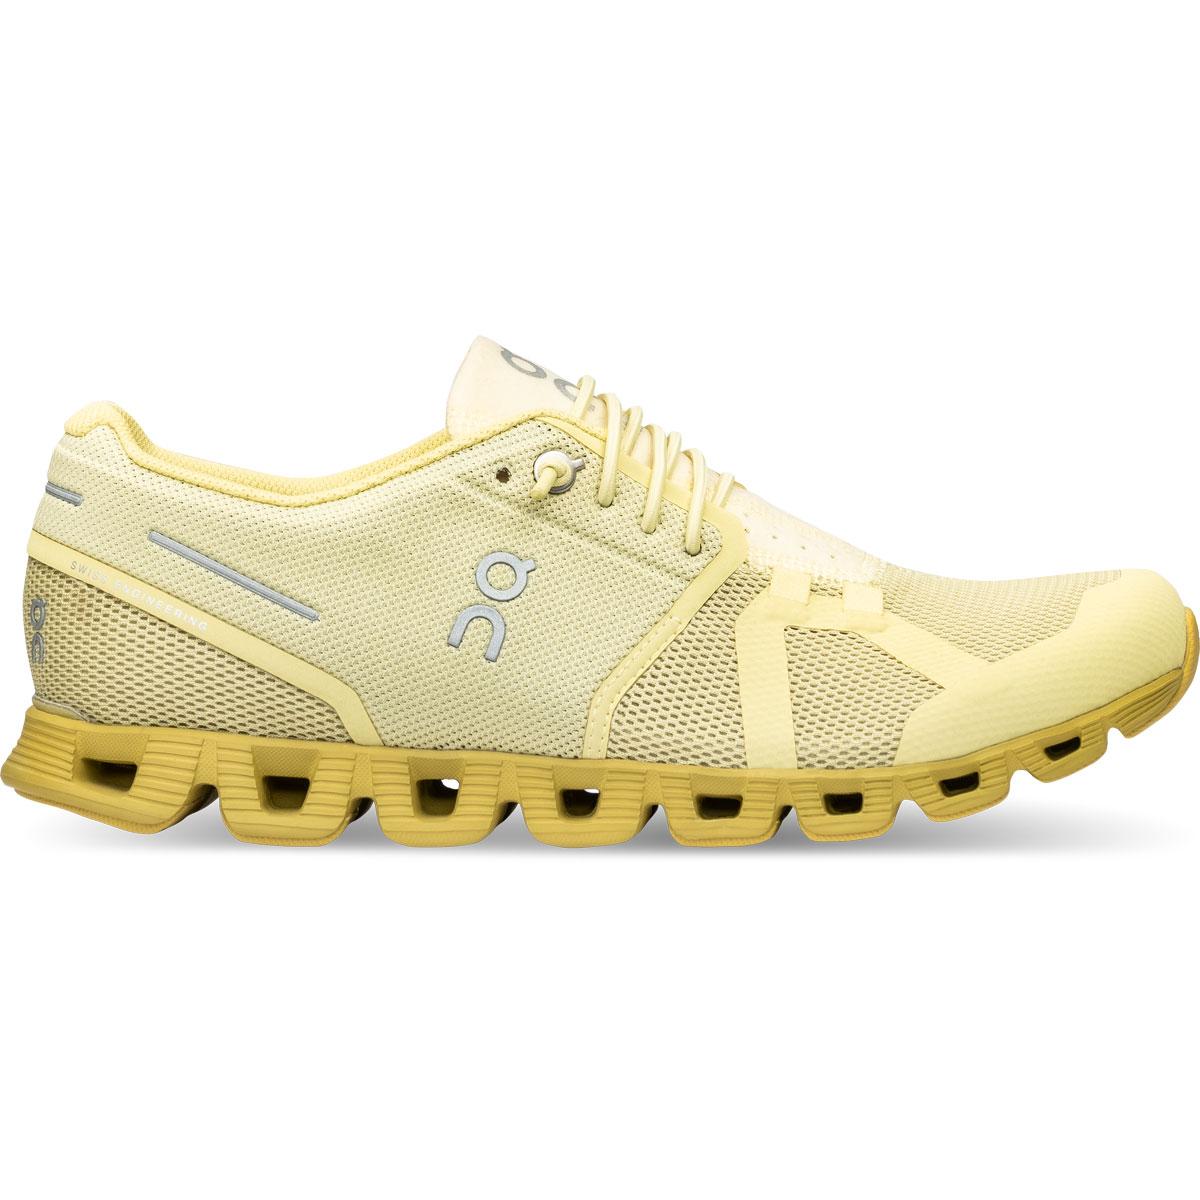 Women's On Cloud Monochrome Running Shoe - Color: Endive - Size: 5 - Width: Regular, Endive, large, image 1